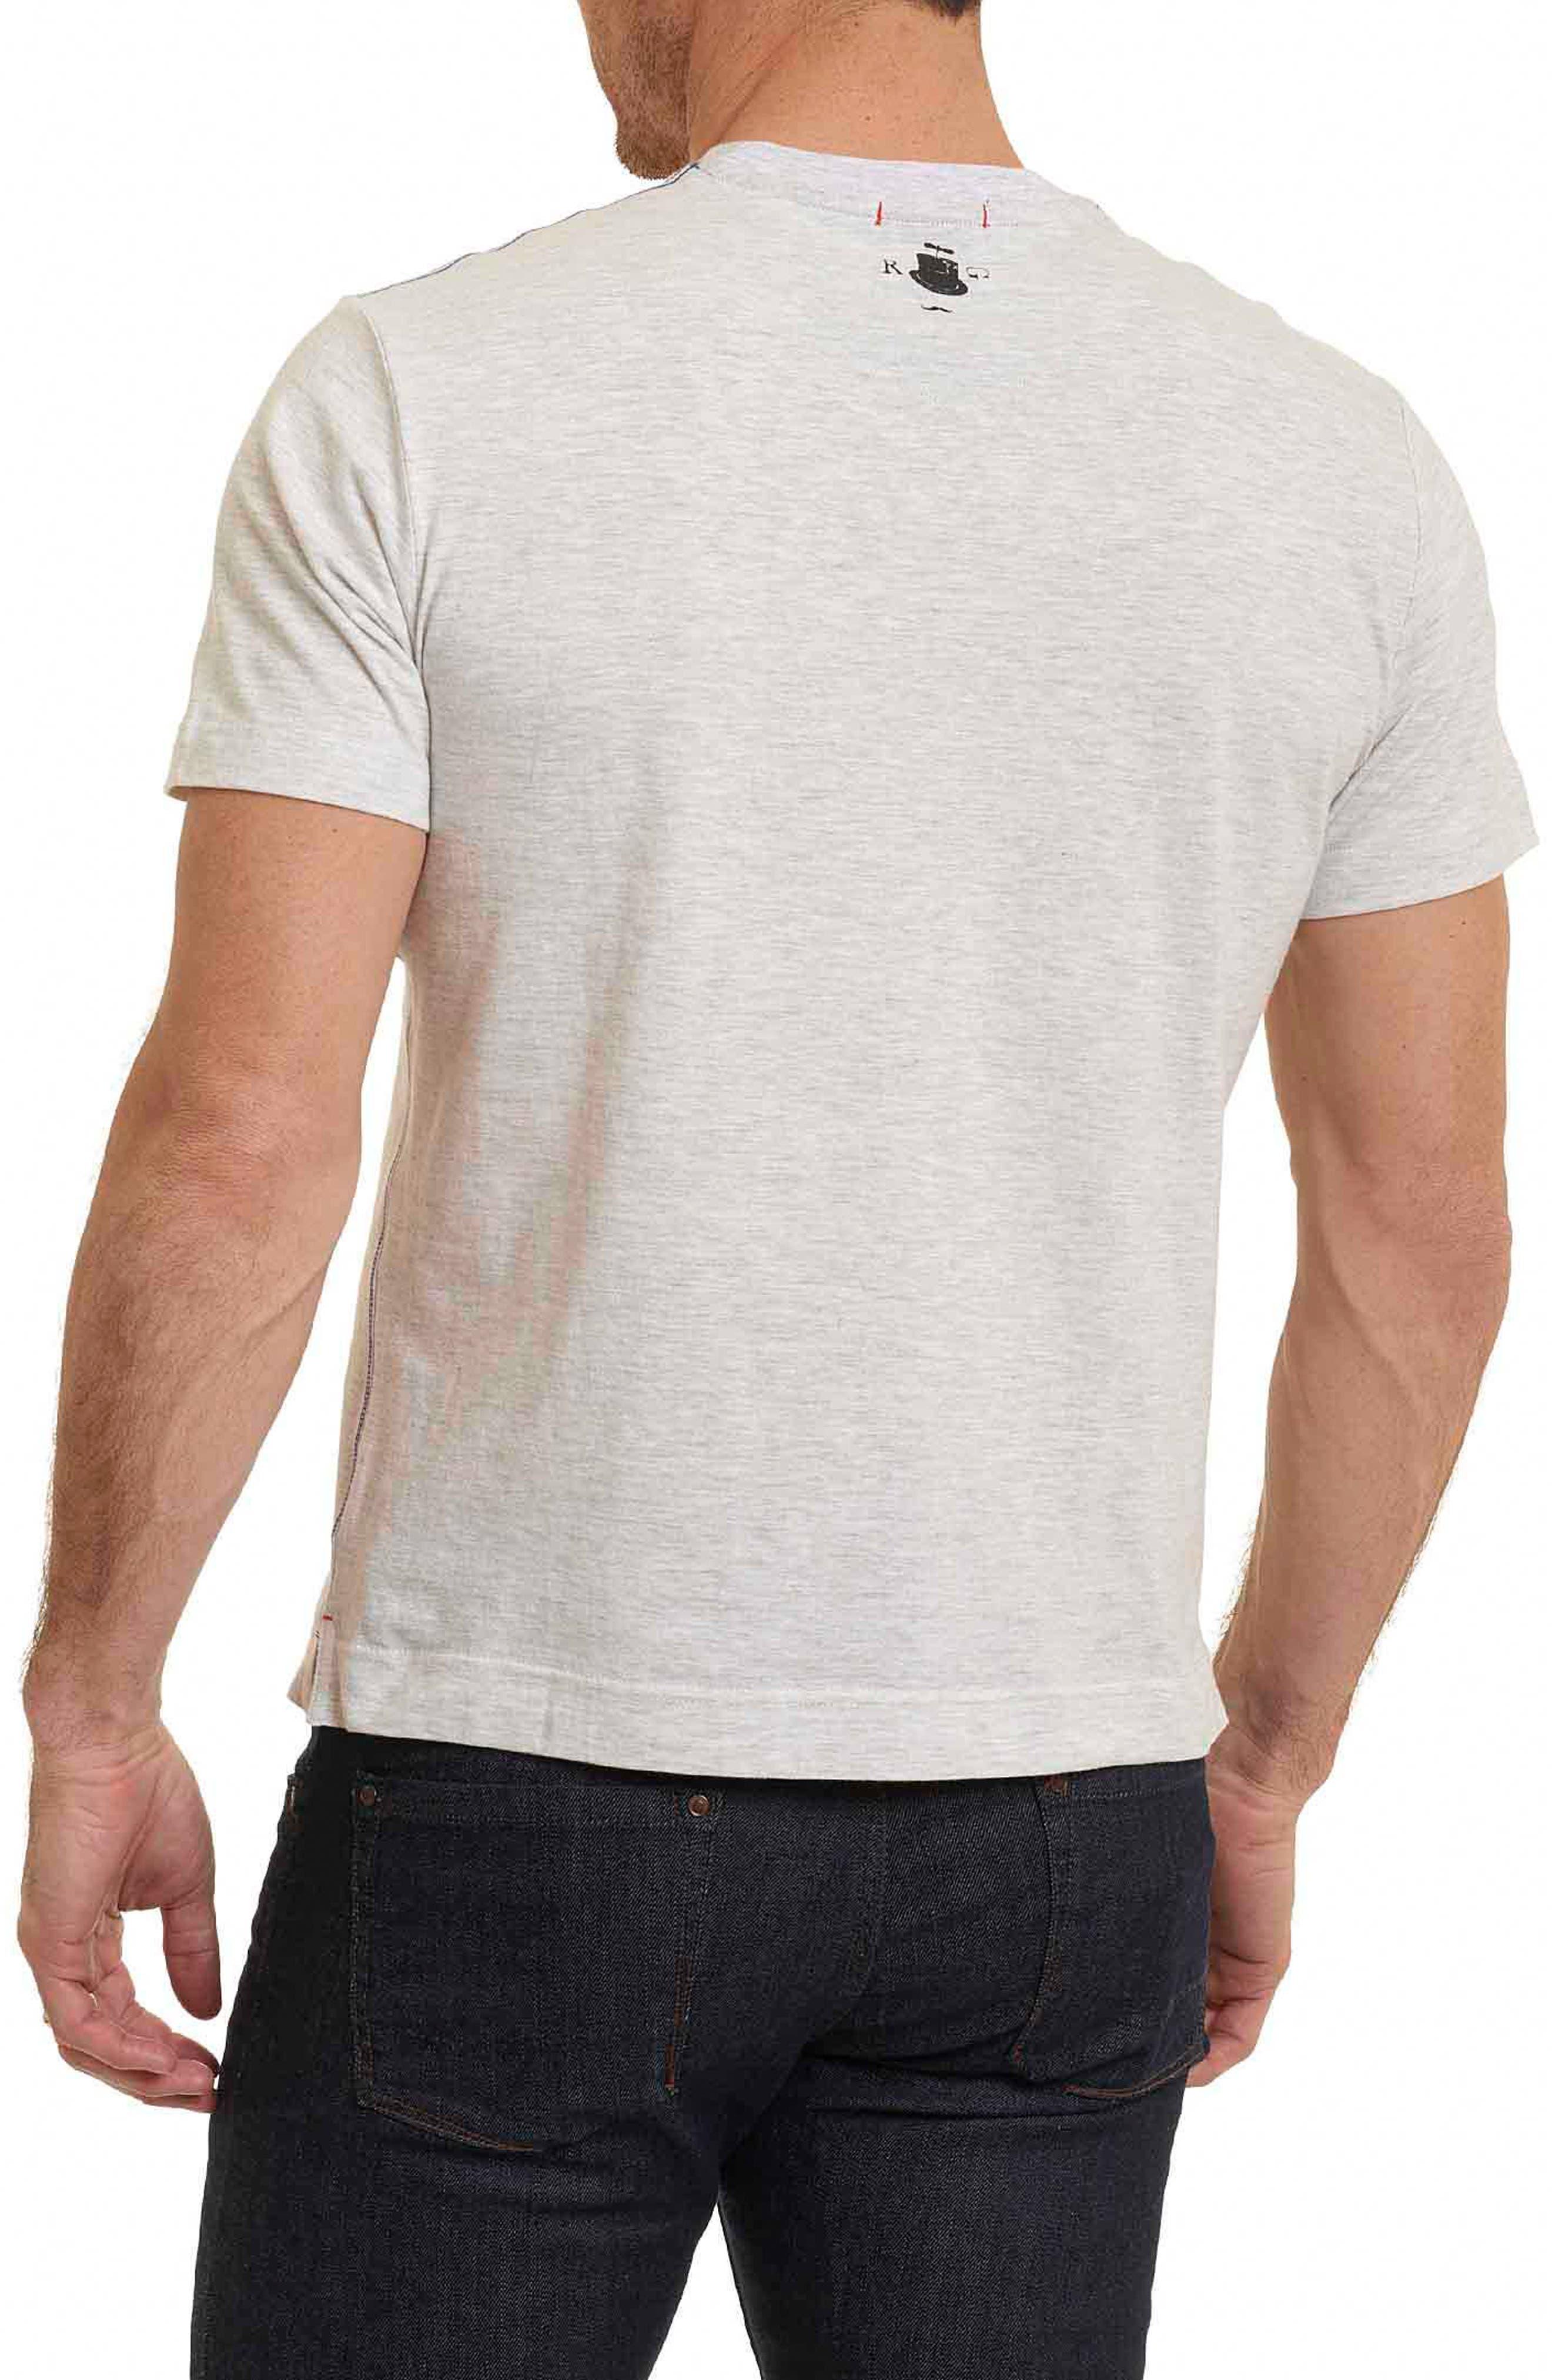 Guns Ready T-Shirt,                             Alternate thumbnail 2, color,                             Oatmeal